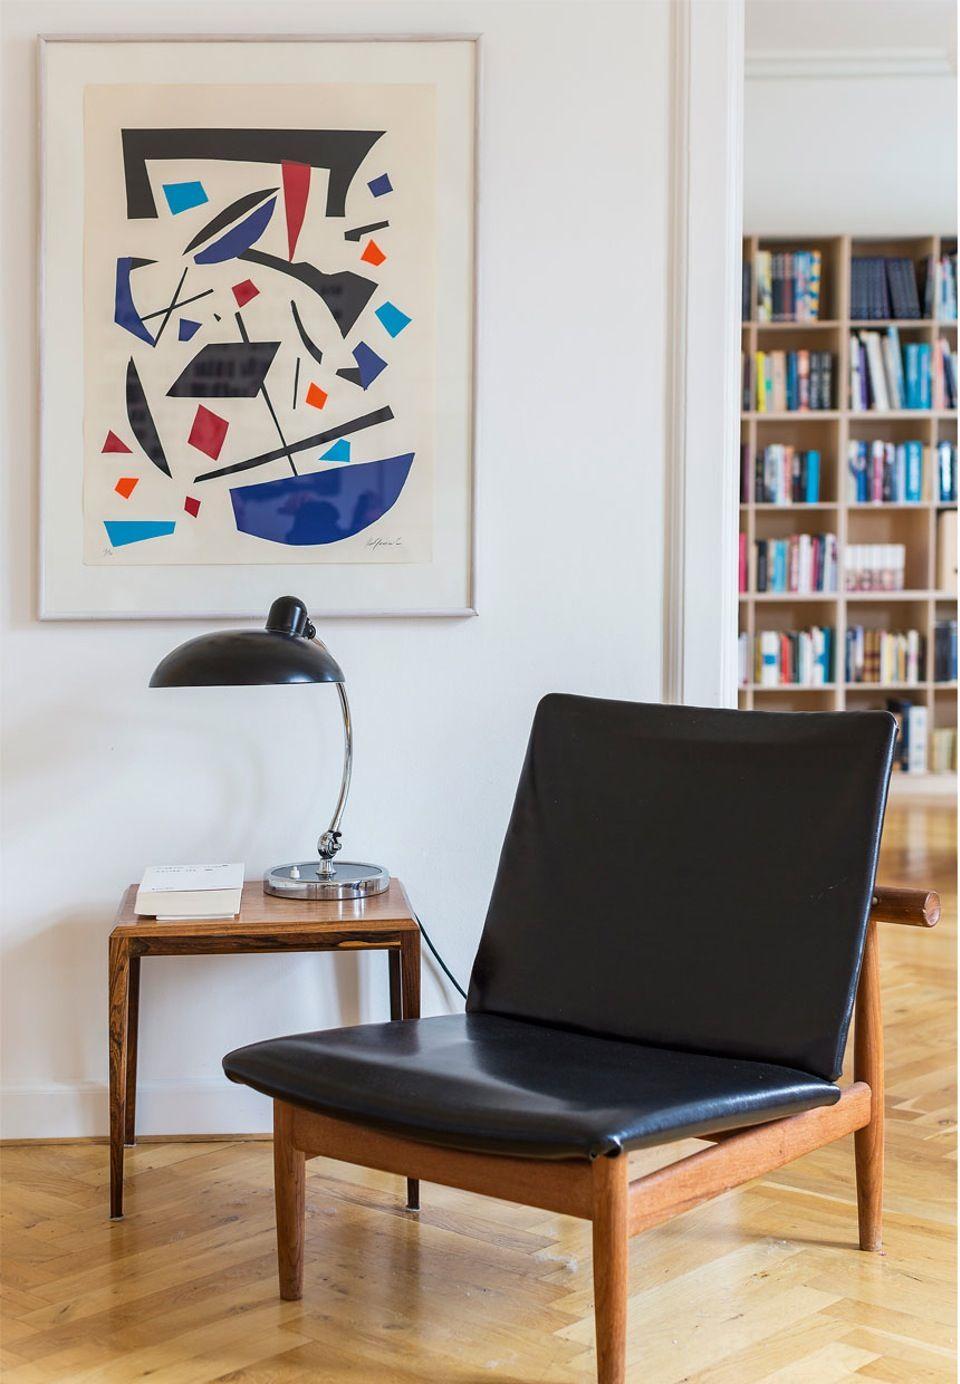 Anne Aarslandu0027s Artistic Apartment, Frederiksberg, Denmark